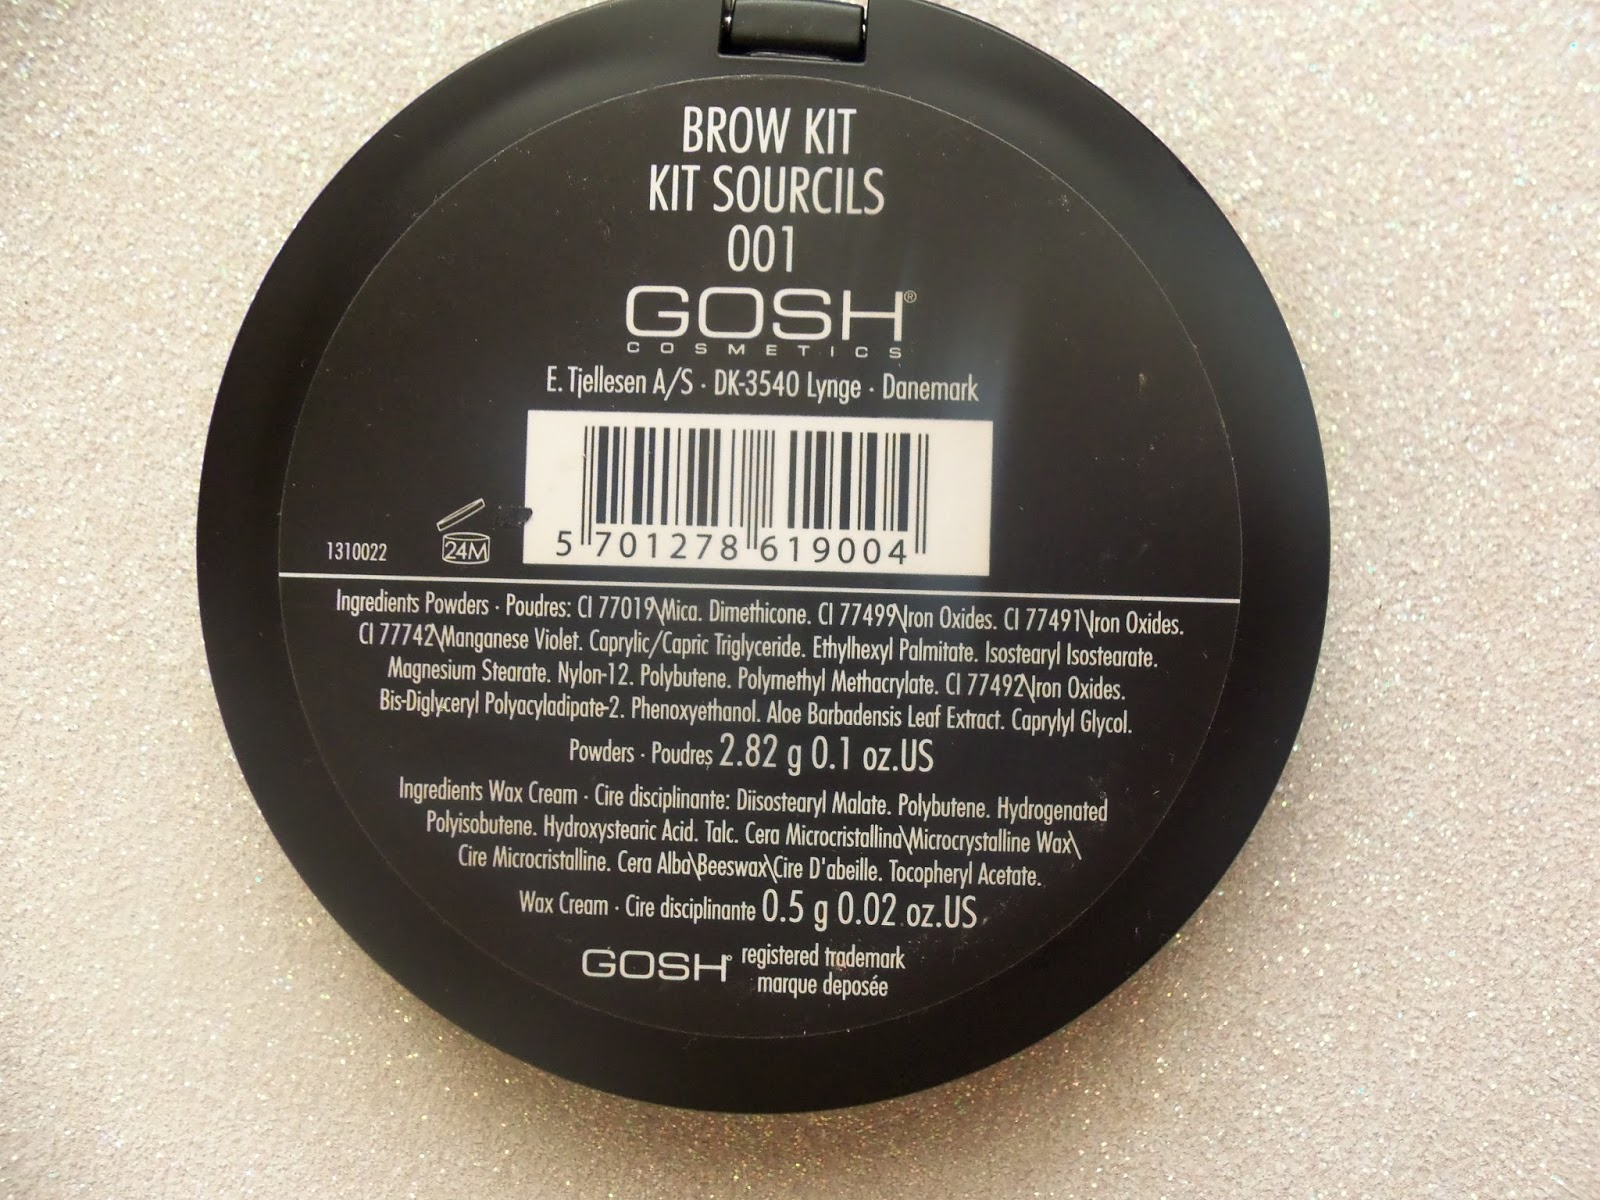 Gosh Brow Kit